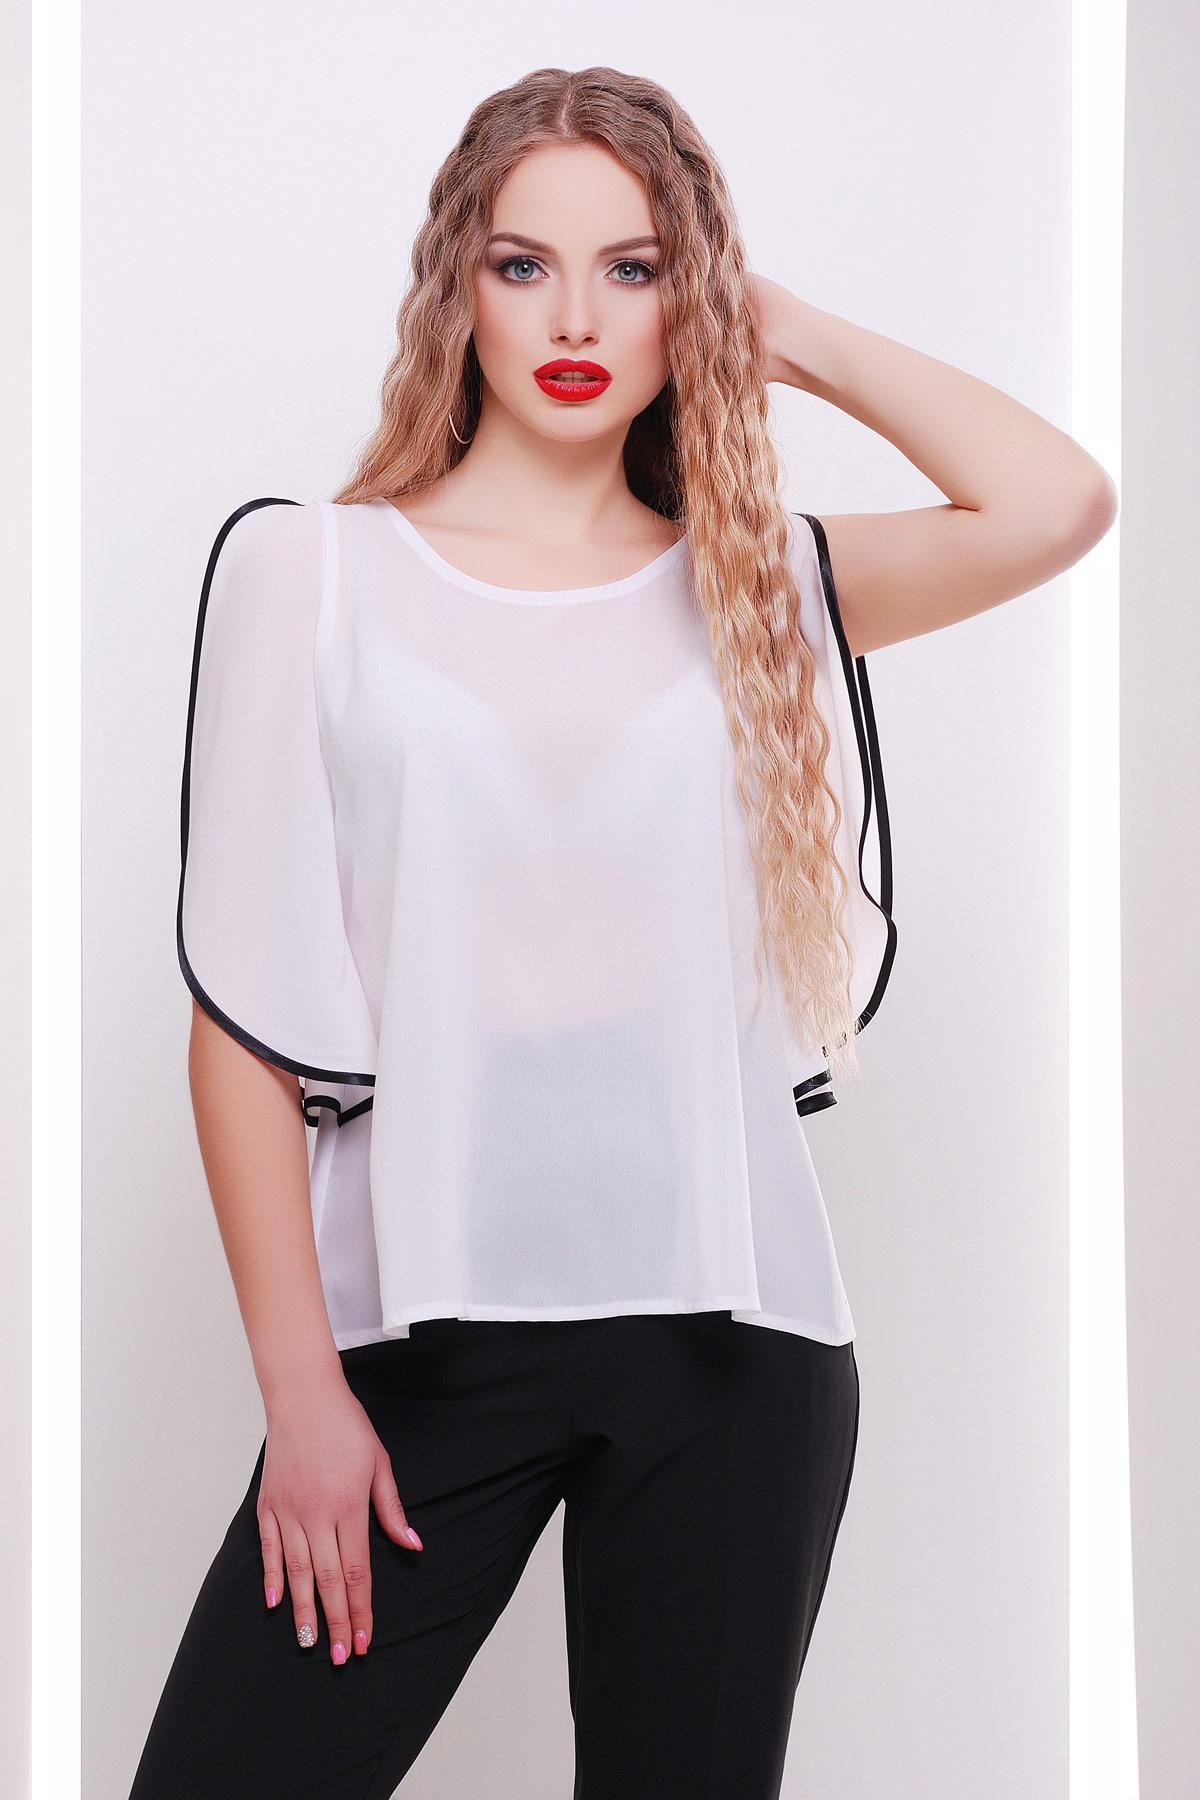 Где купит белую блузку